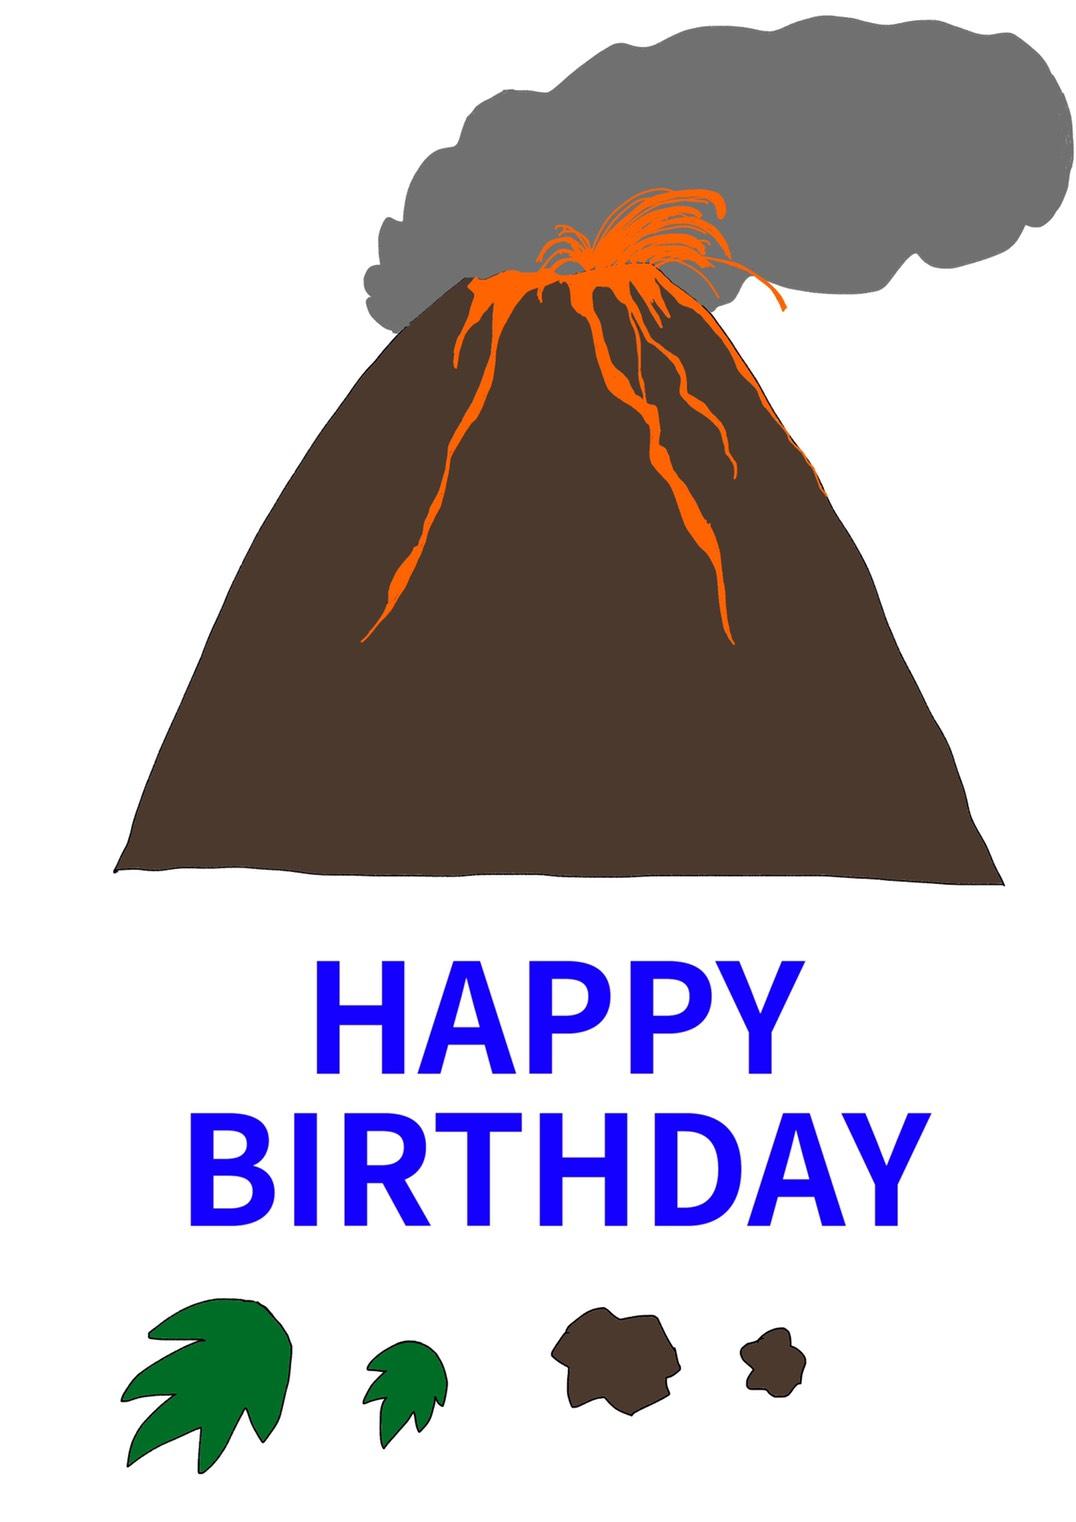 Happy birthday volcano